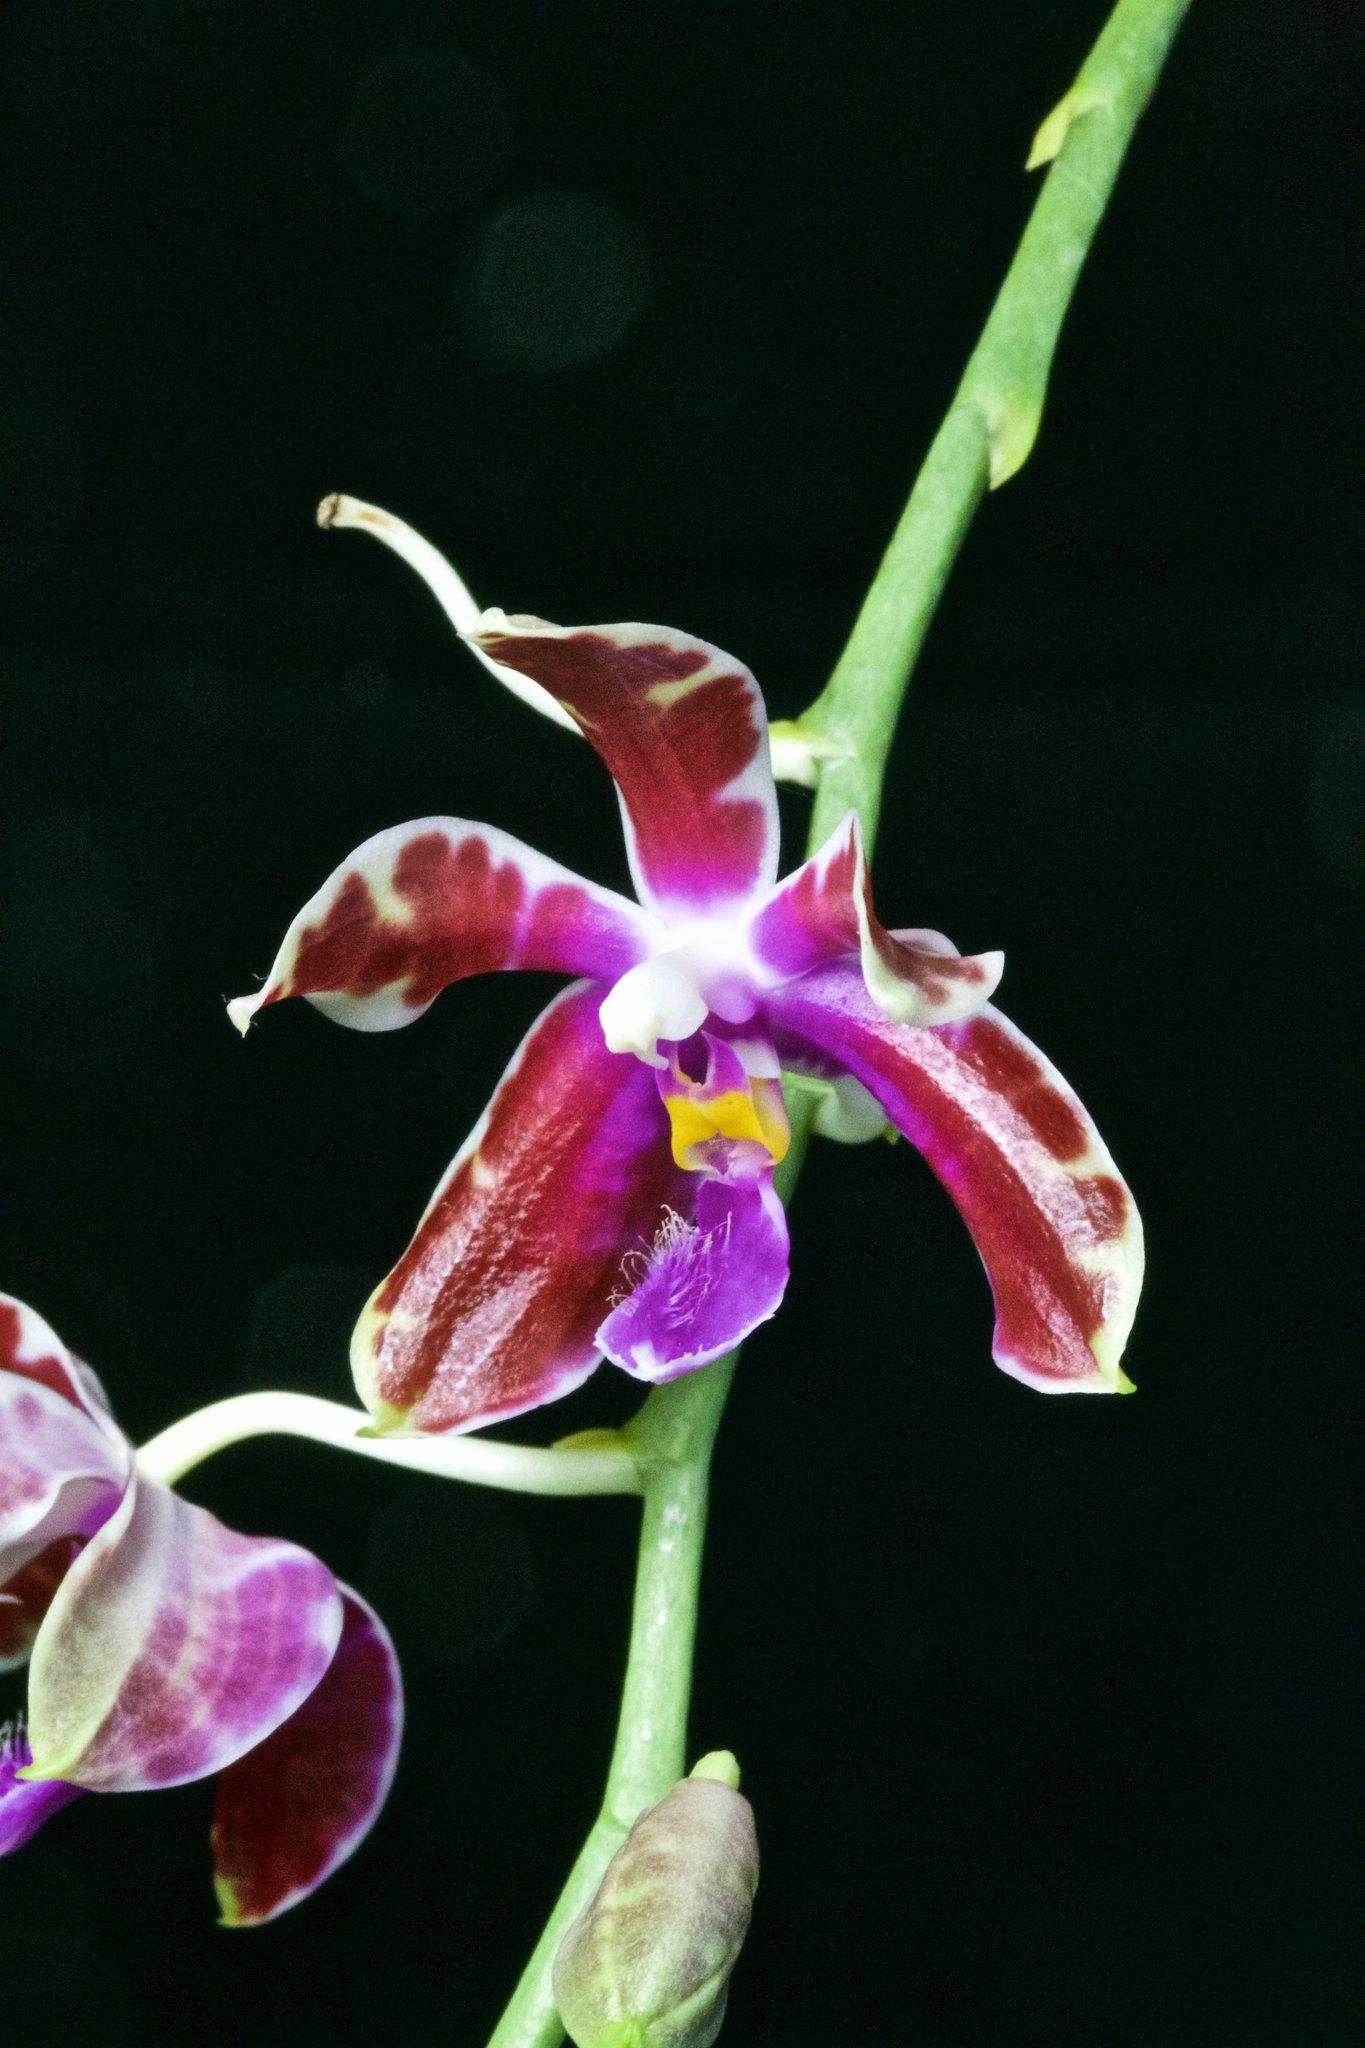 Phalaenopsis mariae x pulchra 20206587608_f13ad3e64d_k